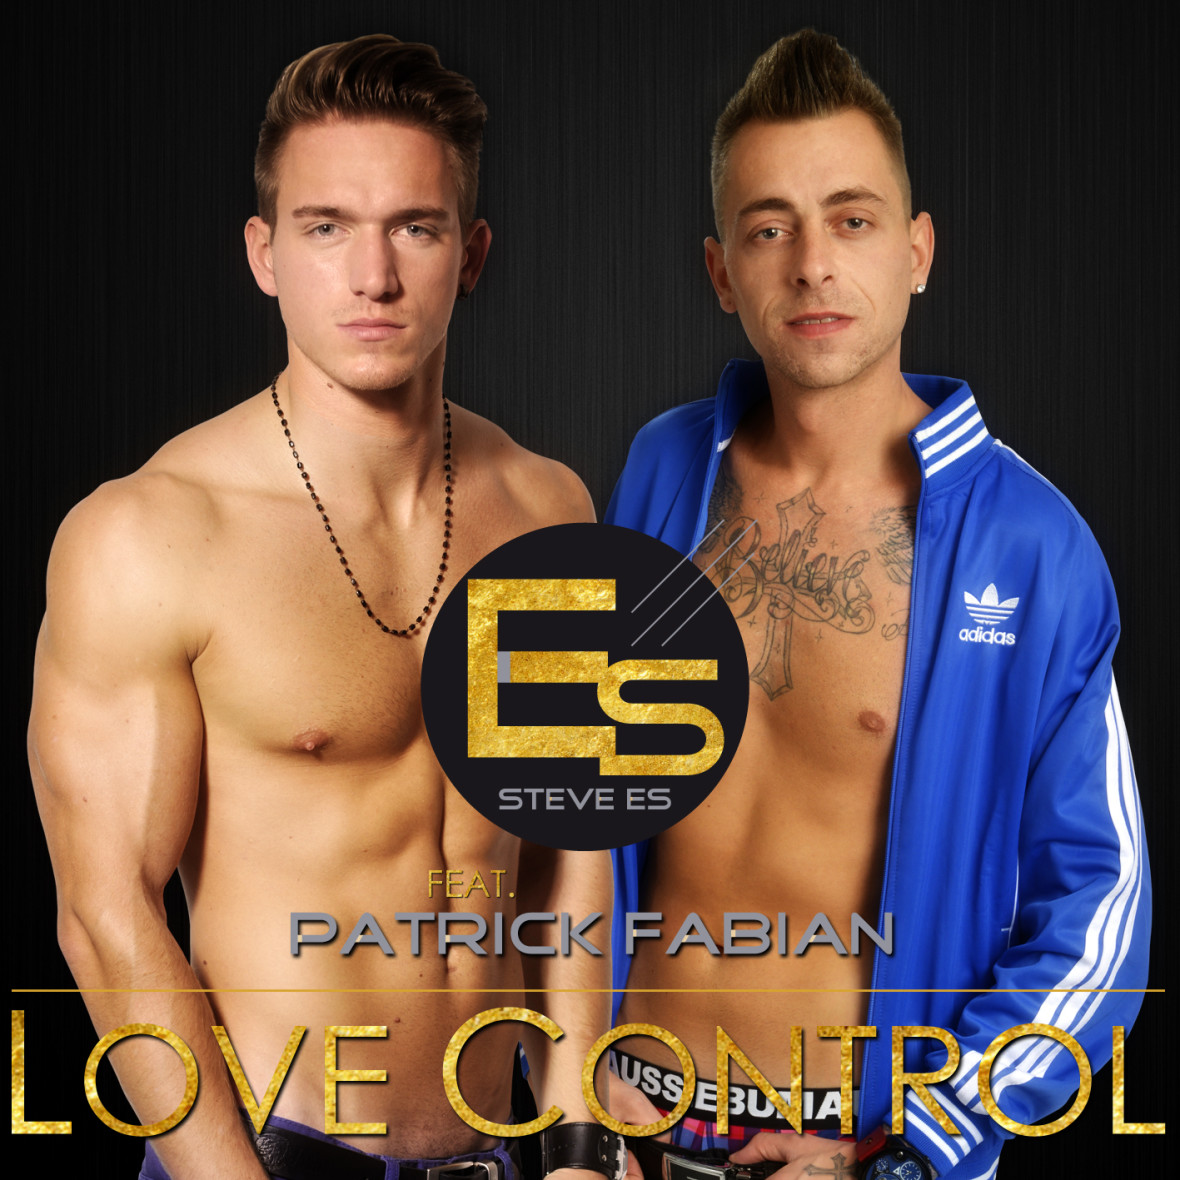 STEVE ES ft. PATRICK FABIAN – Love Control